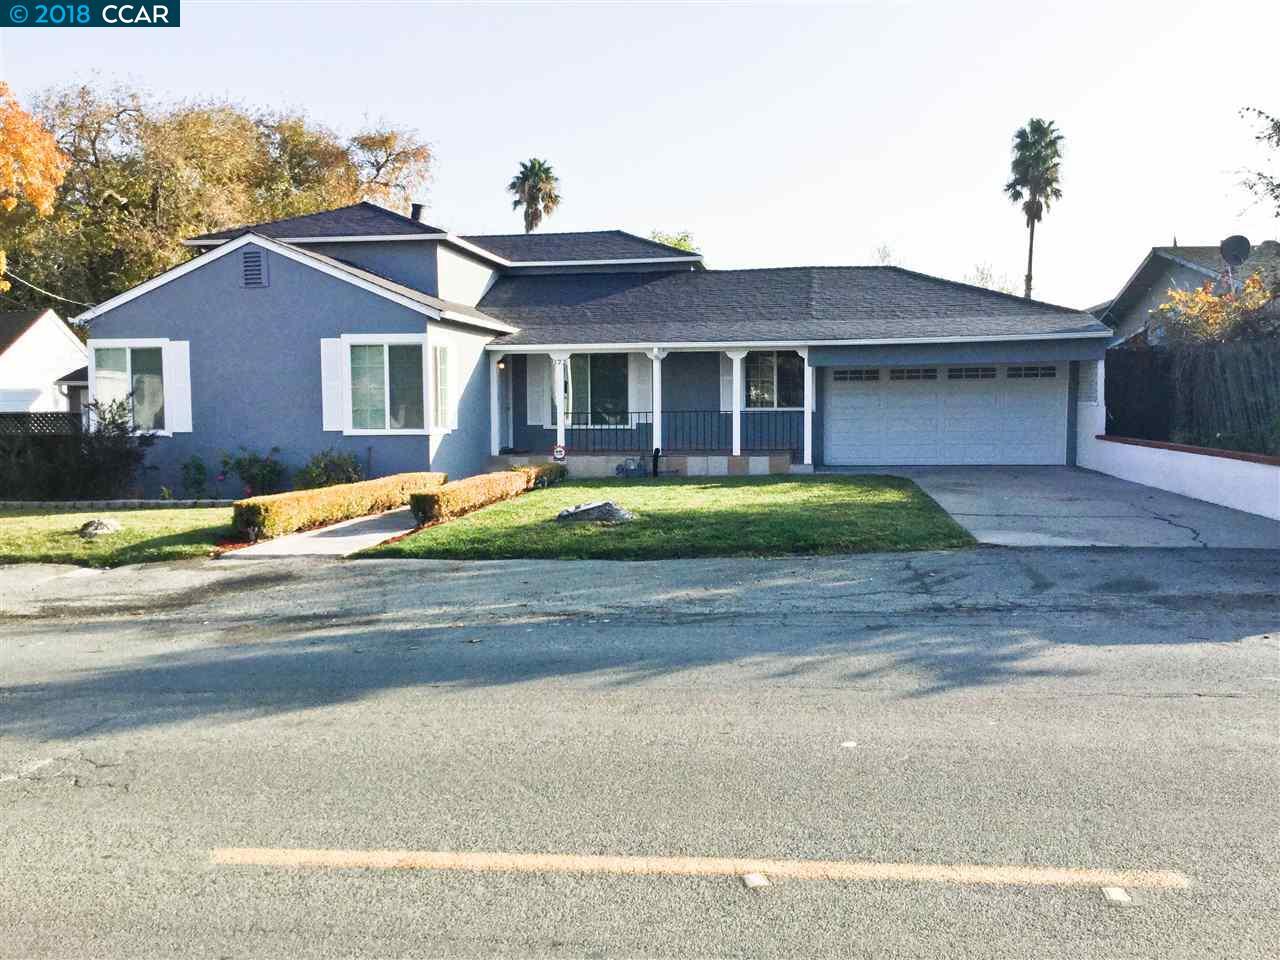 173 Loftus Road, BAY POINT, CA 94565